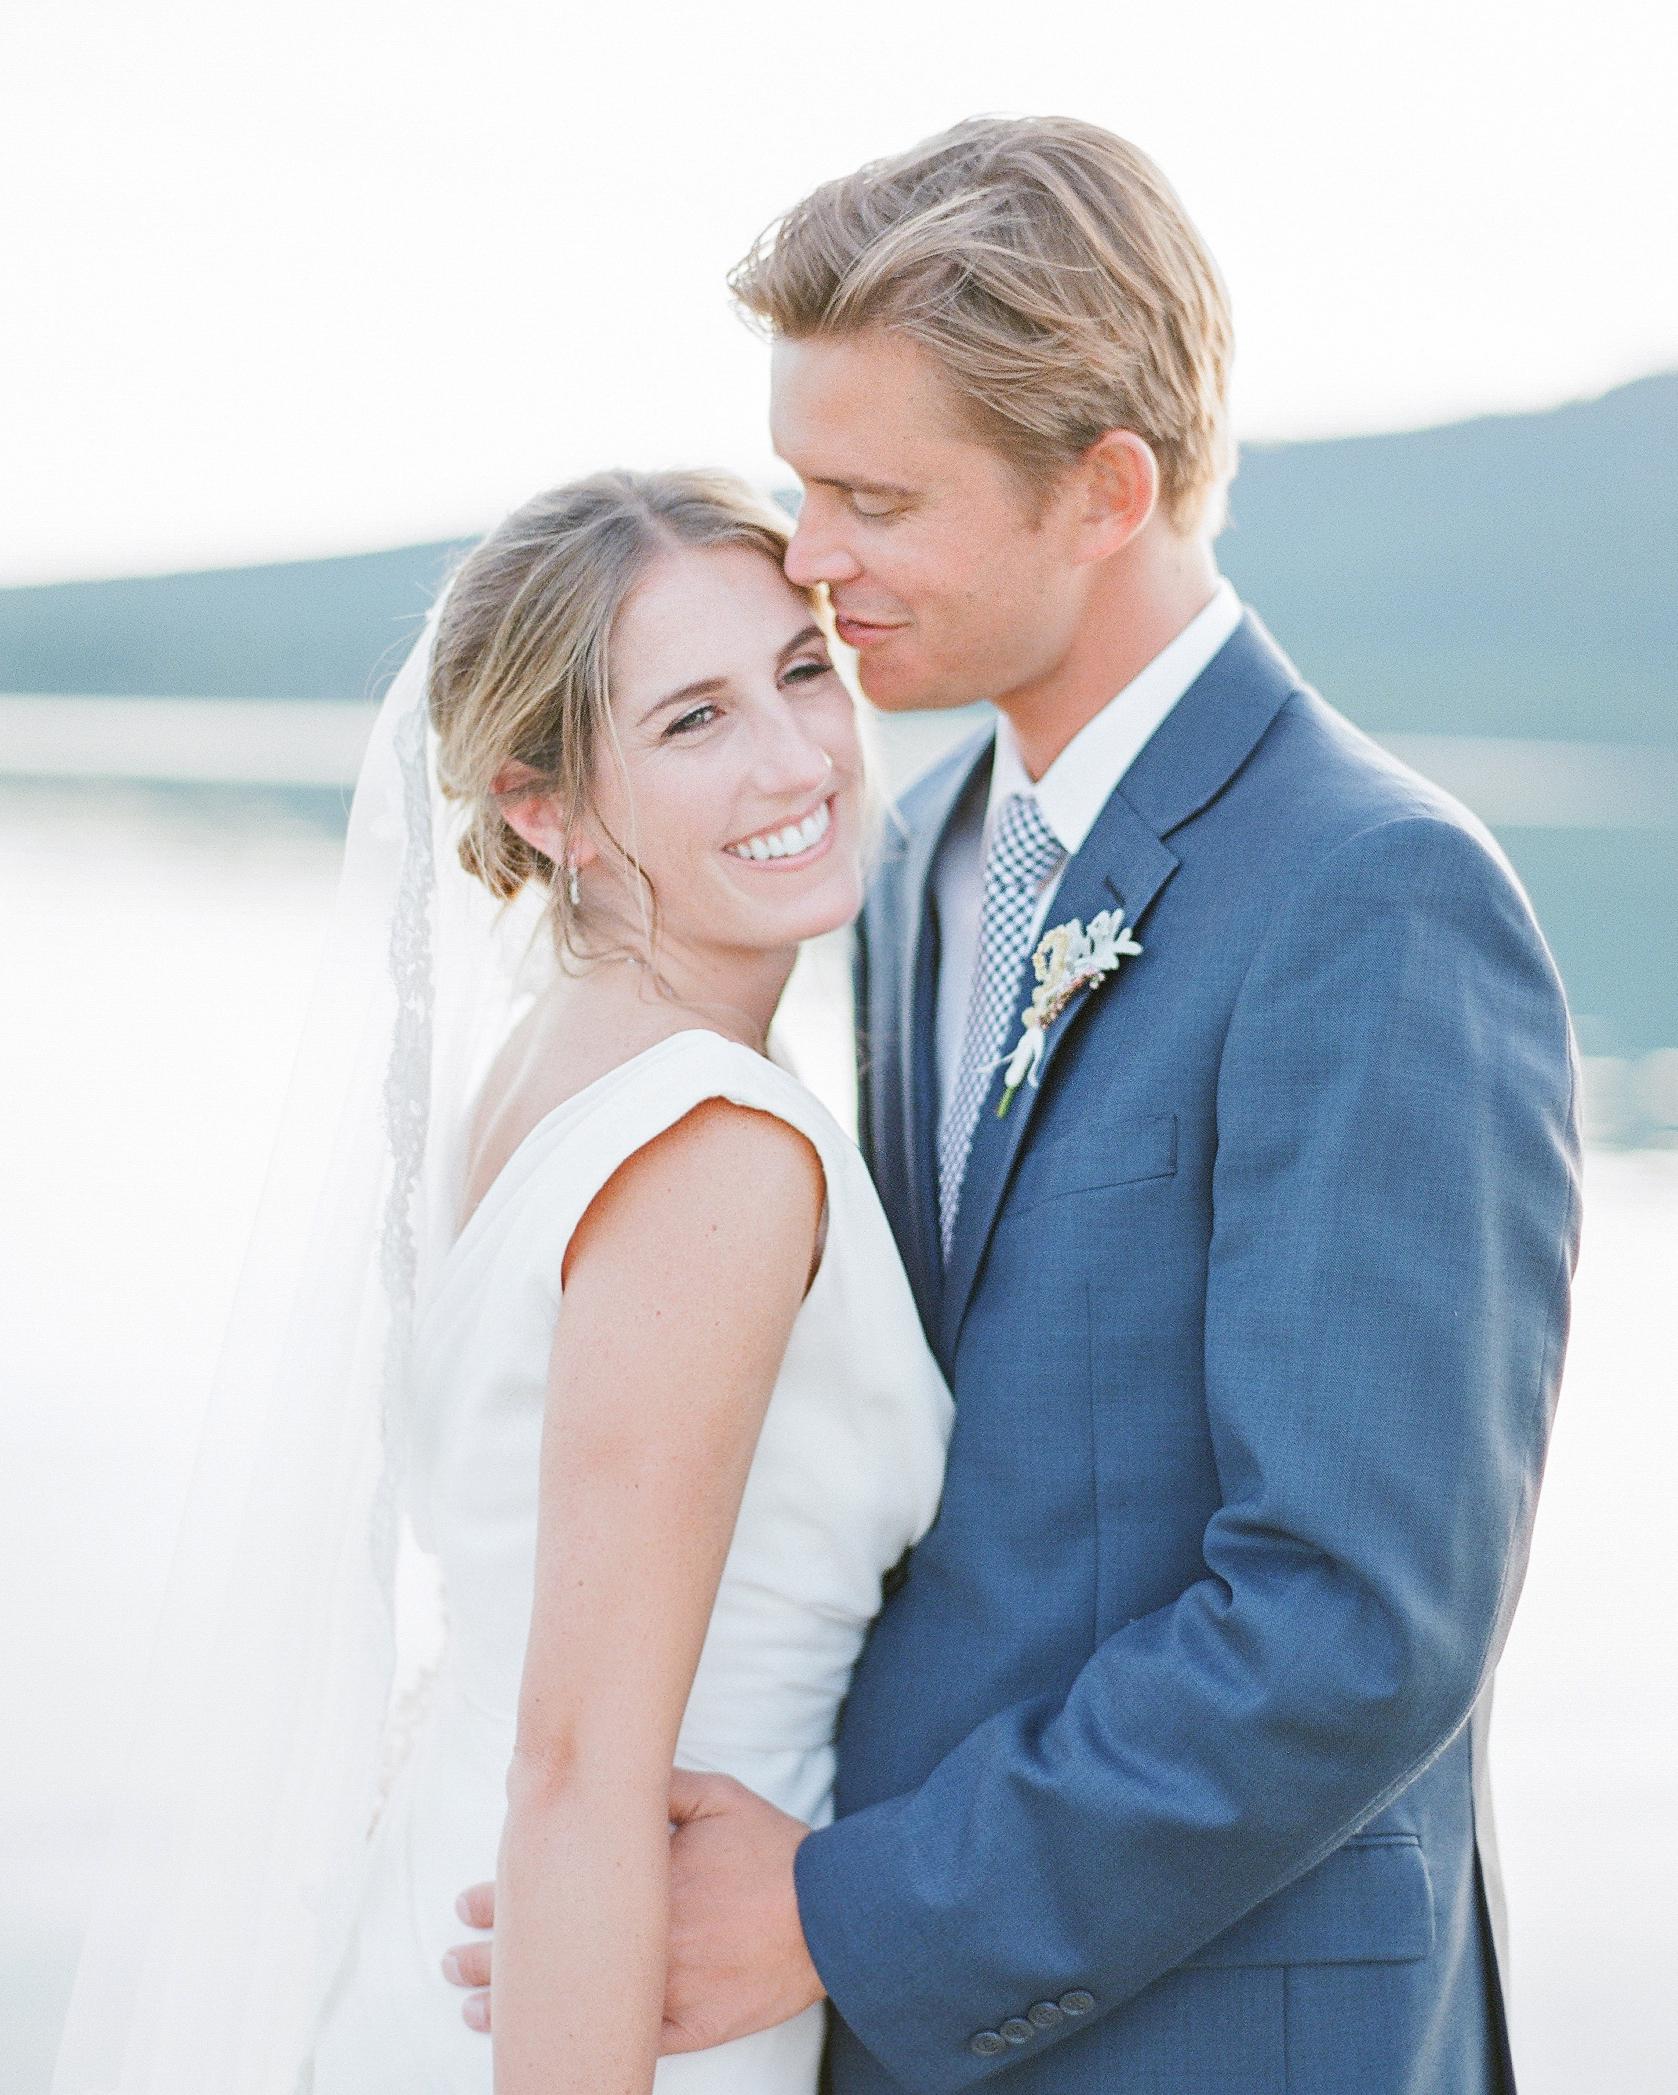 robin-kenny-wedding-couple-091-s112068-0715.jpg